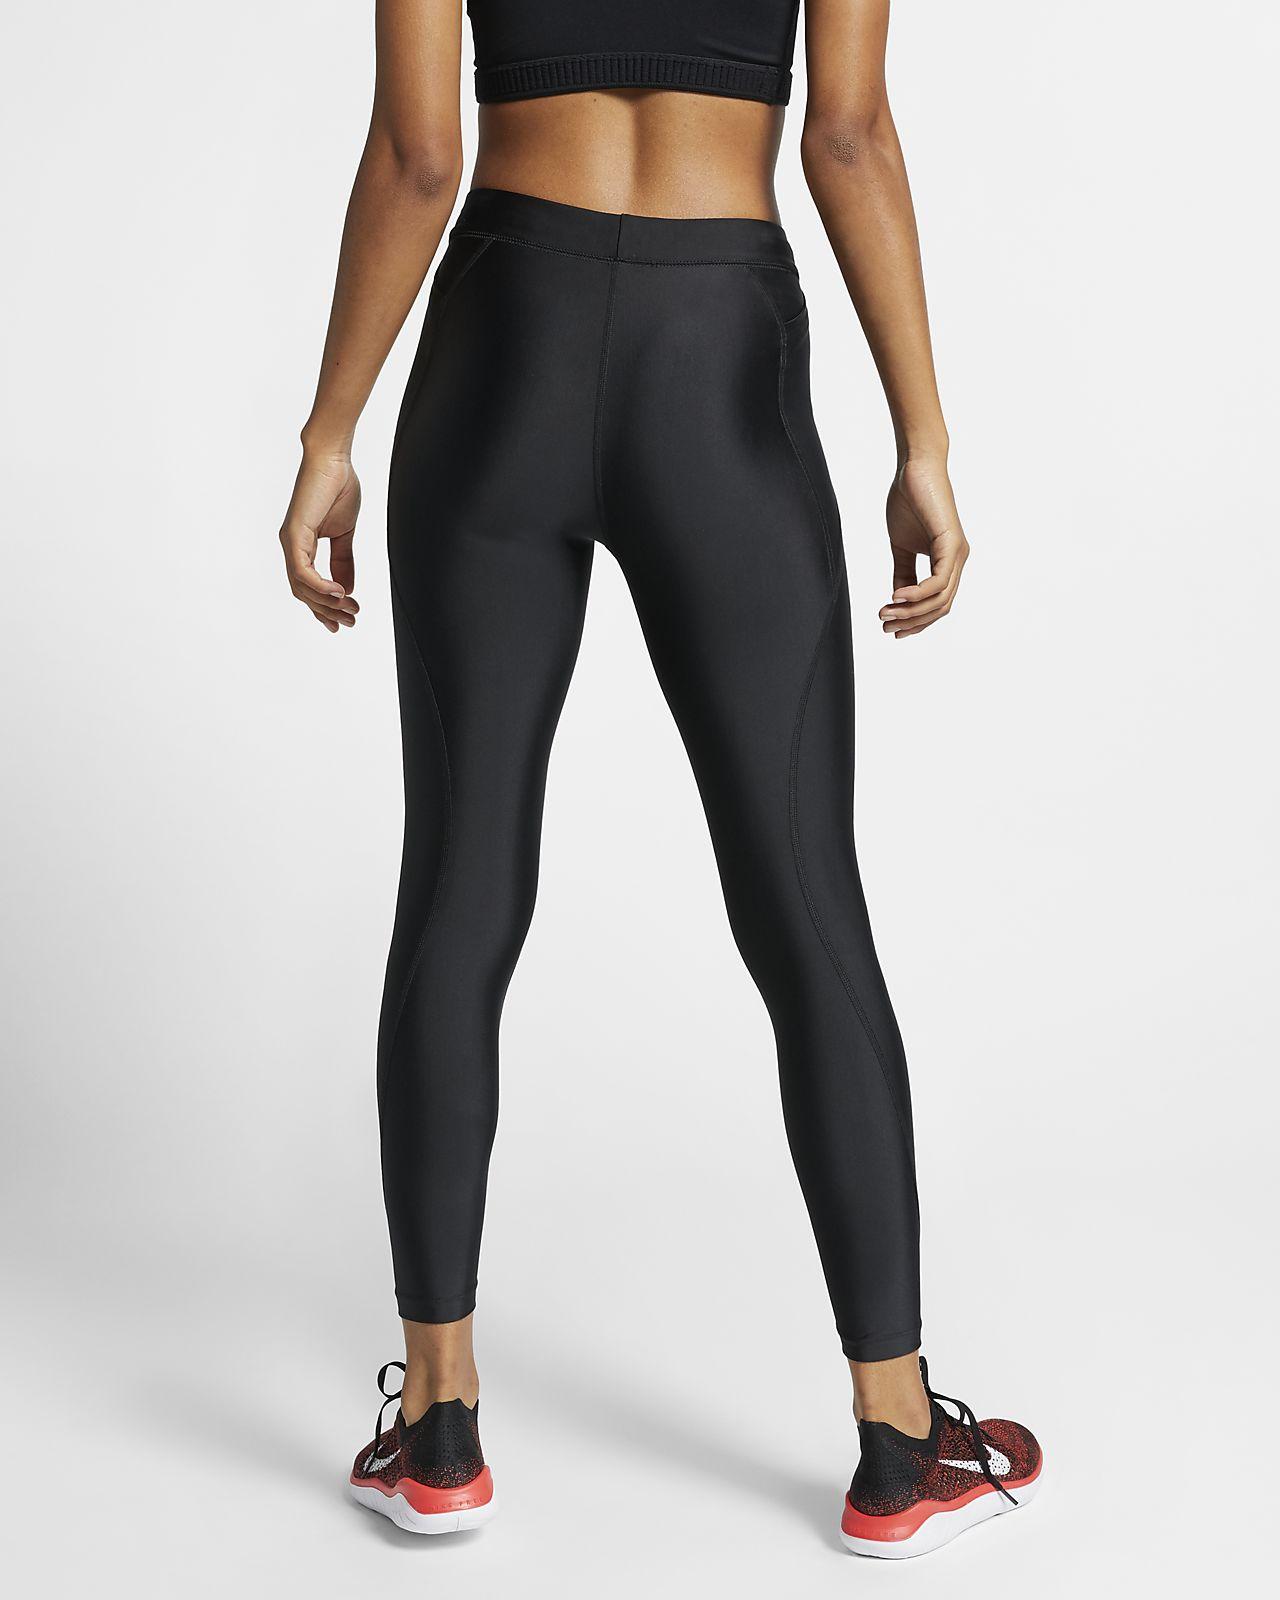 e10775223451 Dámské 7 8 legíny Nike Speed. Nike.com CZ